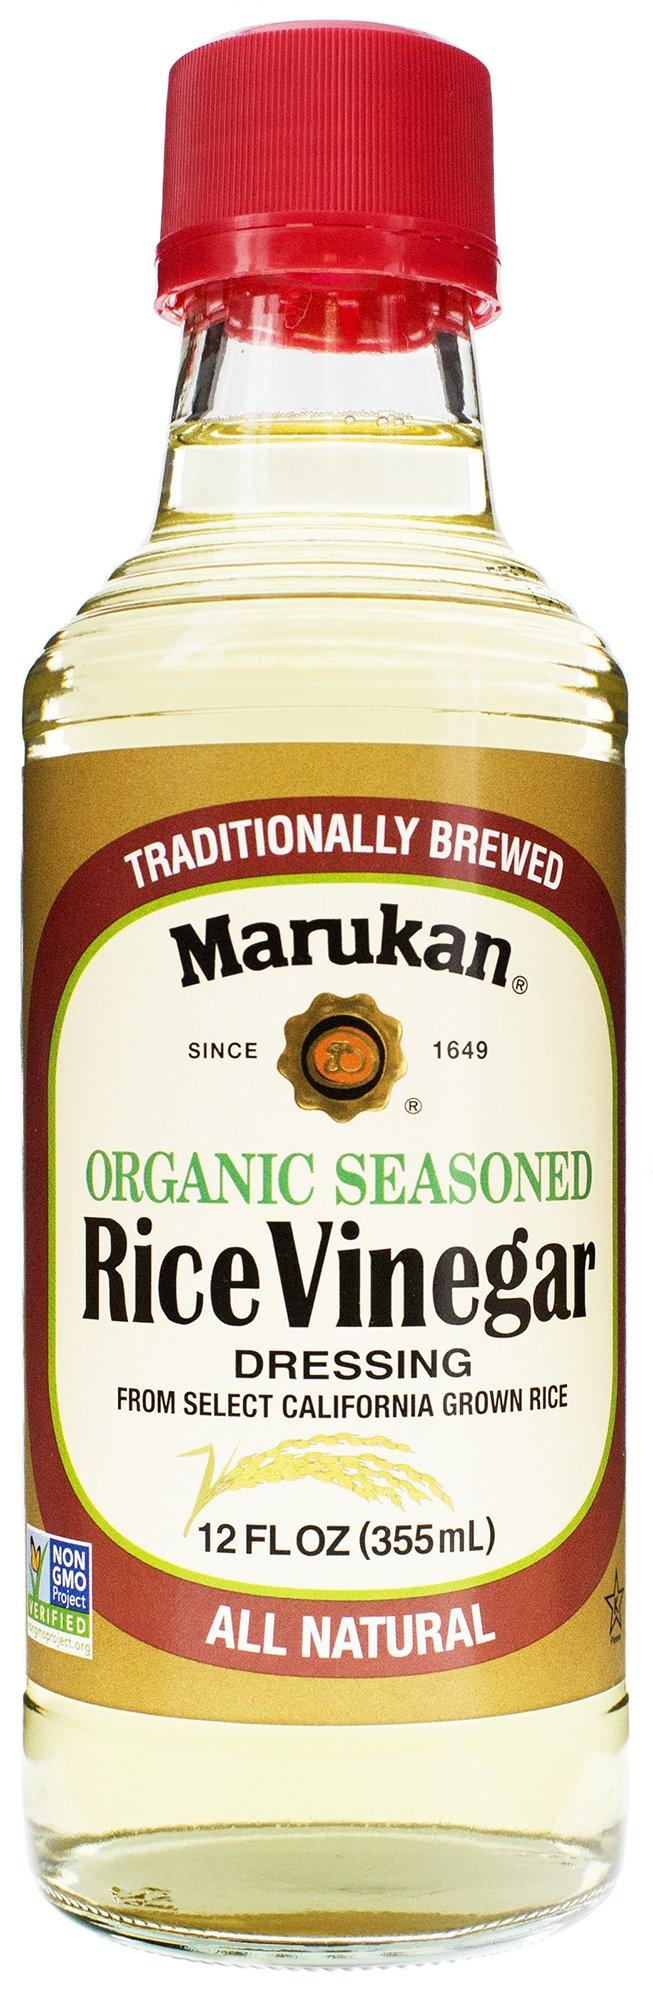 Marukan Seasoned Gourmet Rice Vinegar Dressing, 12 fl oz